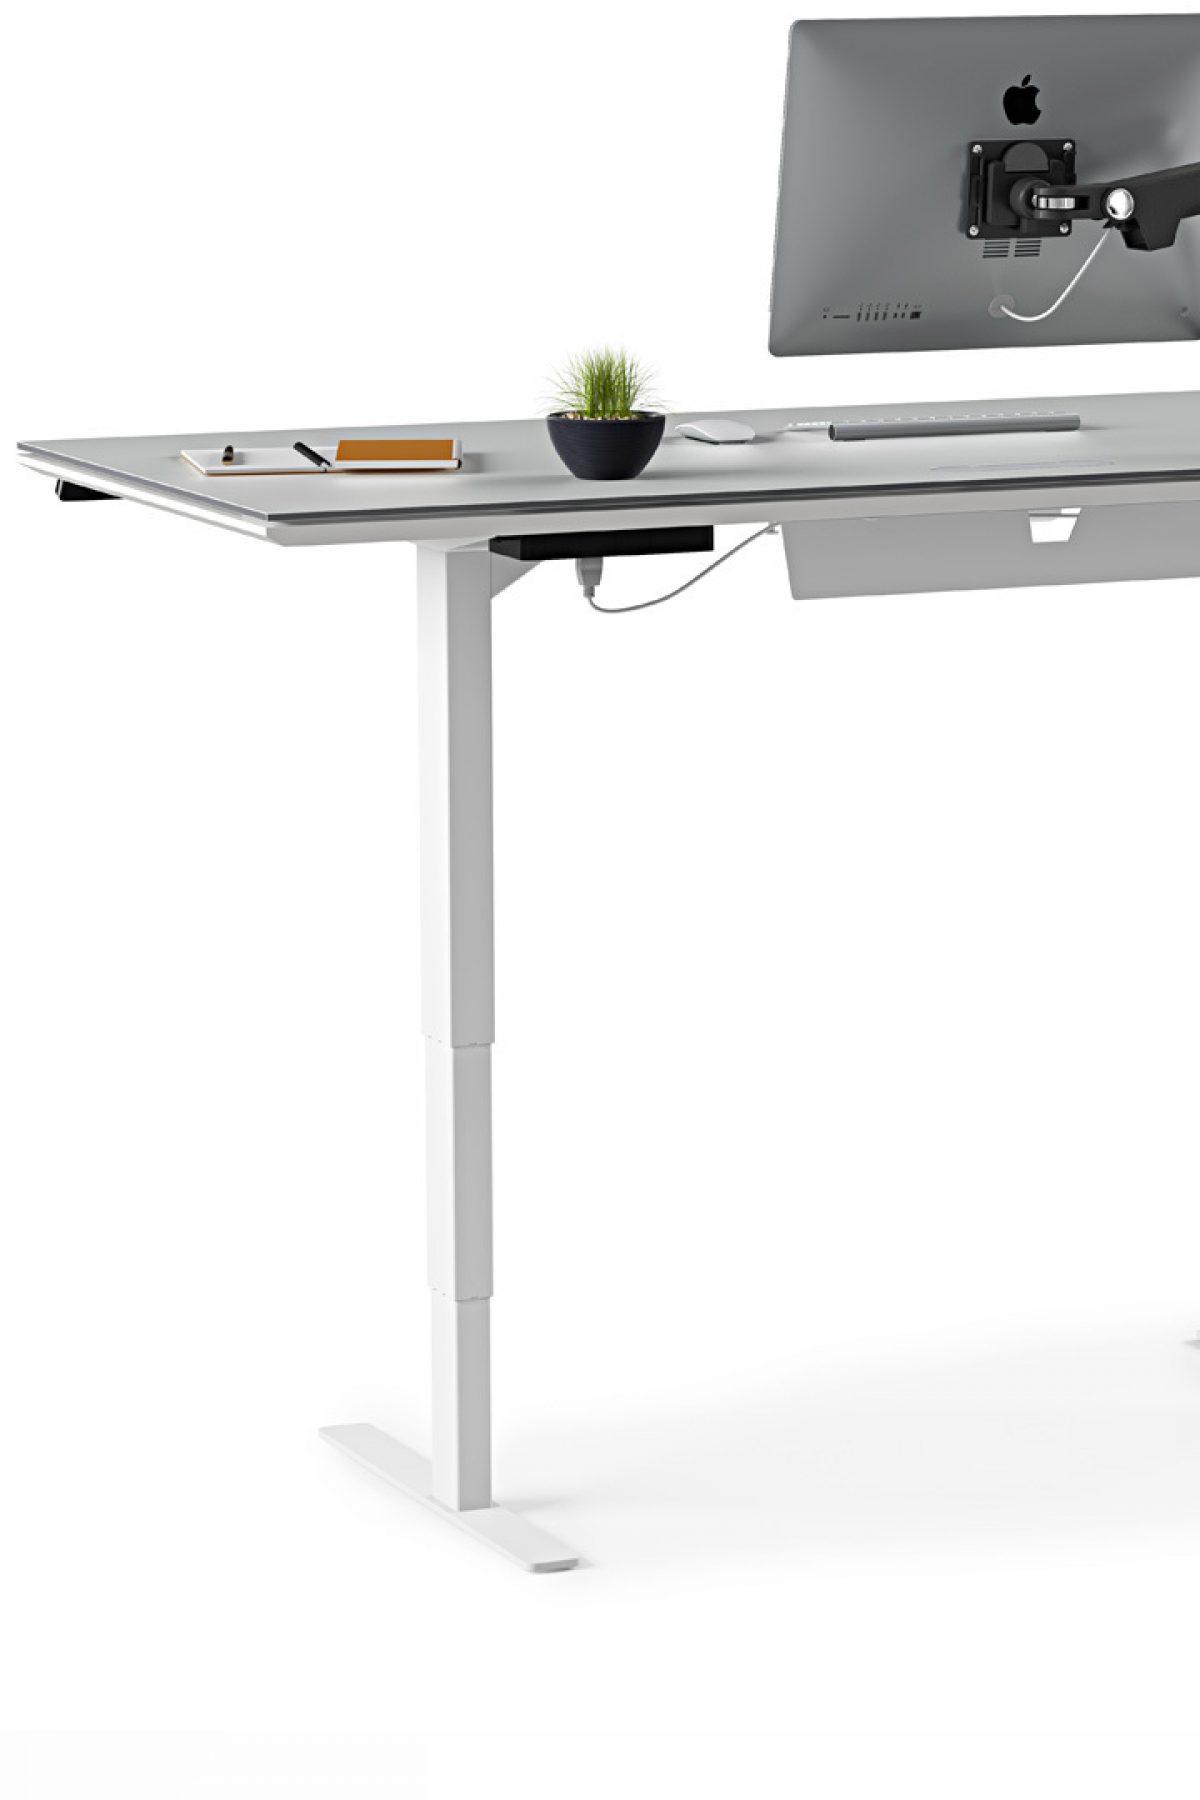 The Centro Lift Desk adjustable standing desk